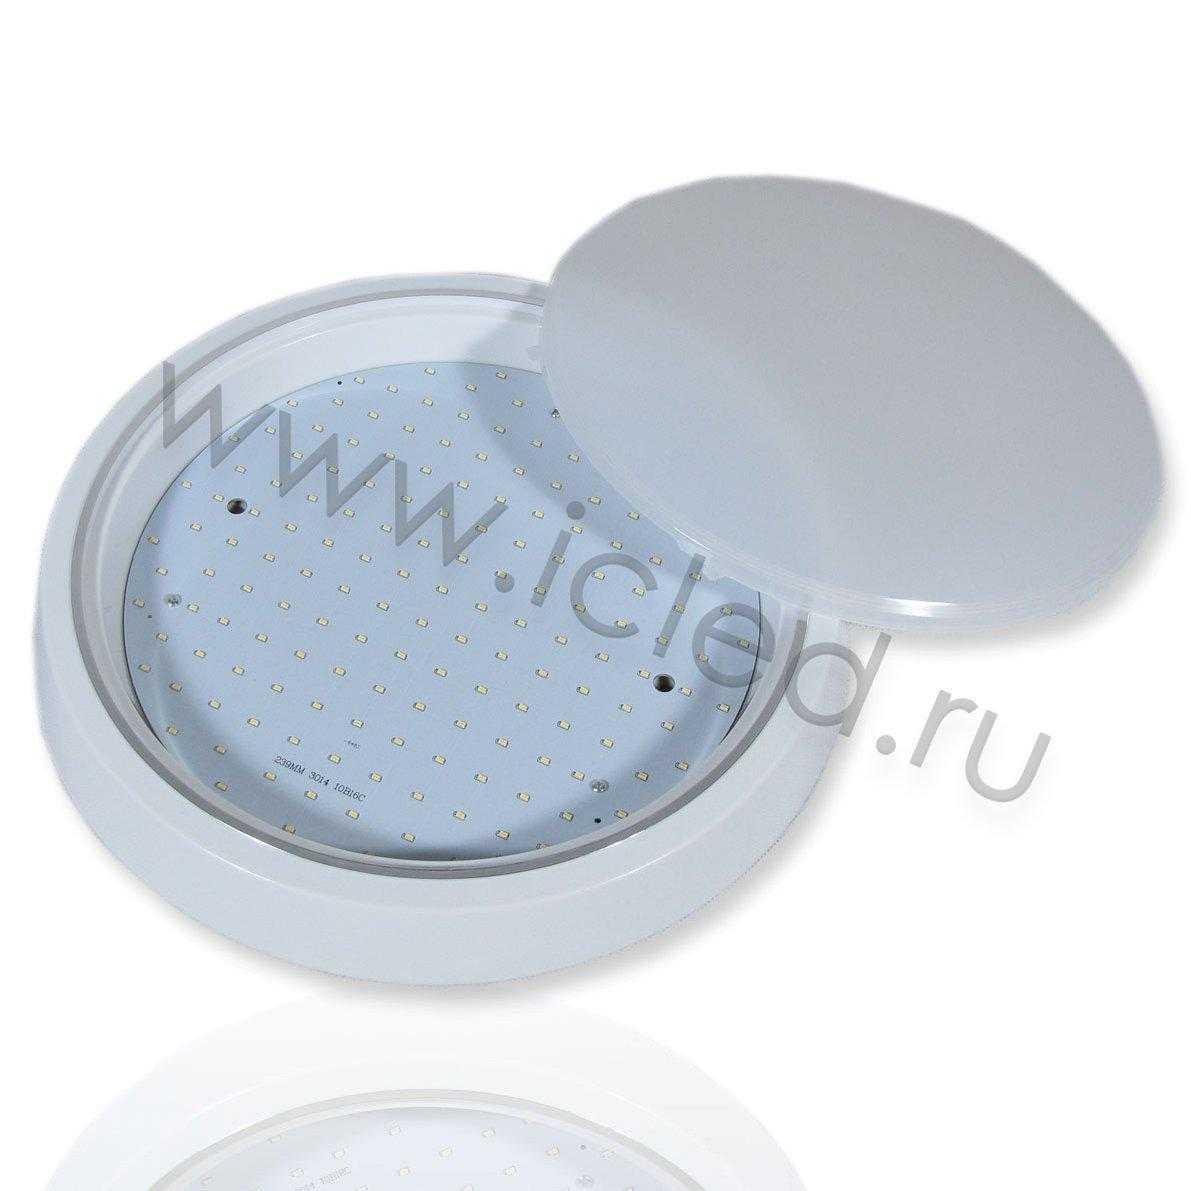 Светодиодный светильник MR-RW D310 (16W, Day White)